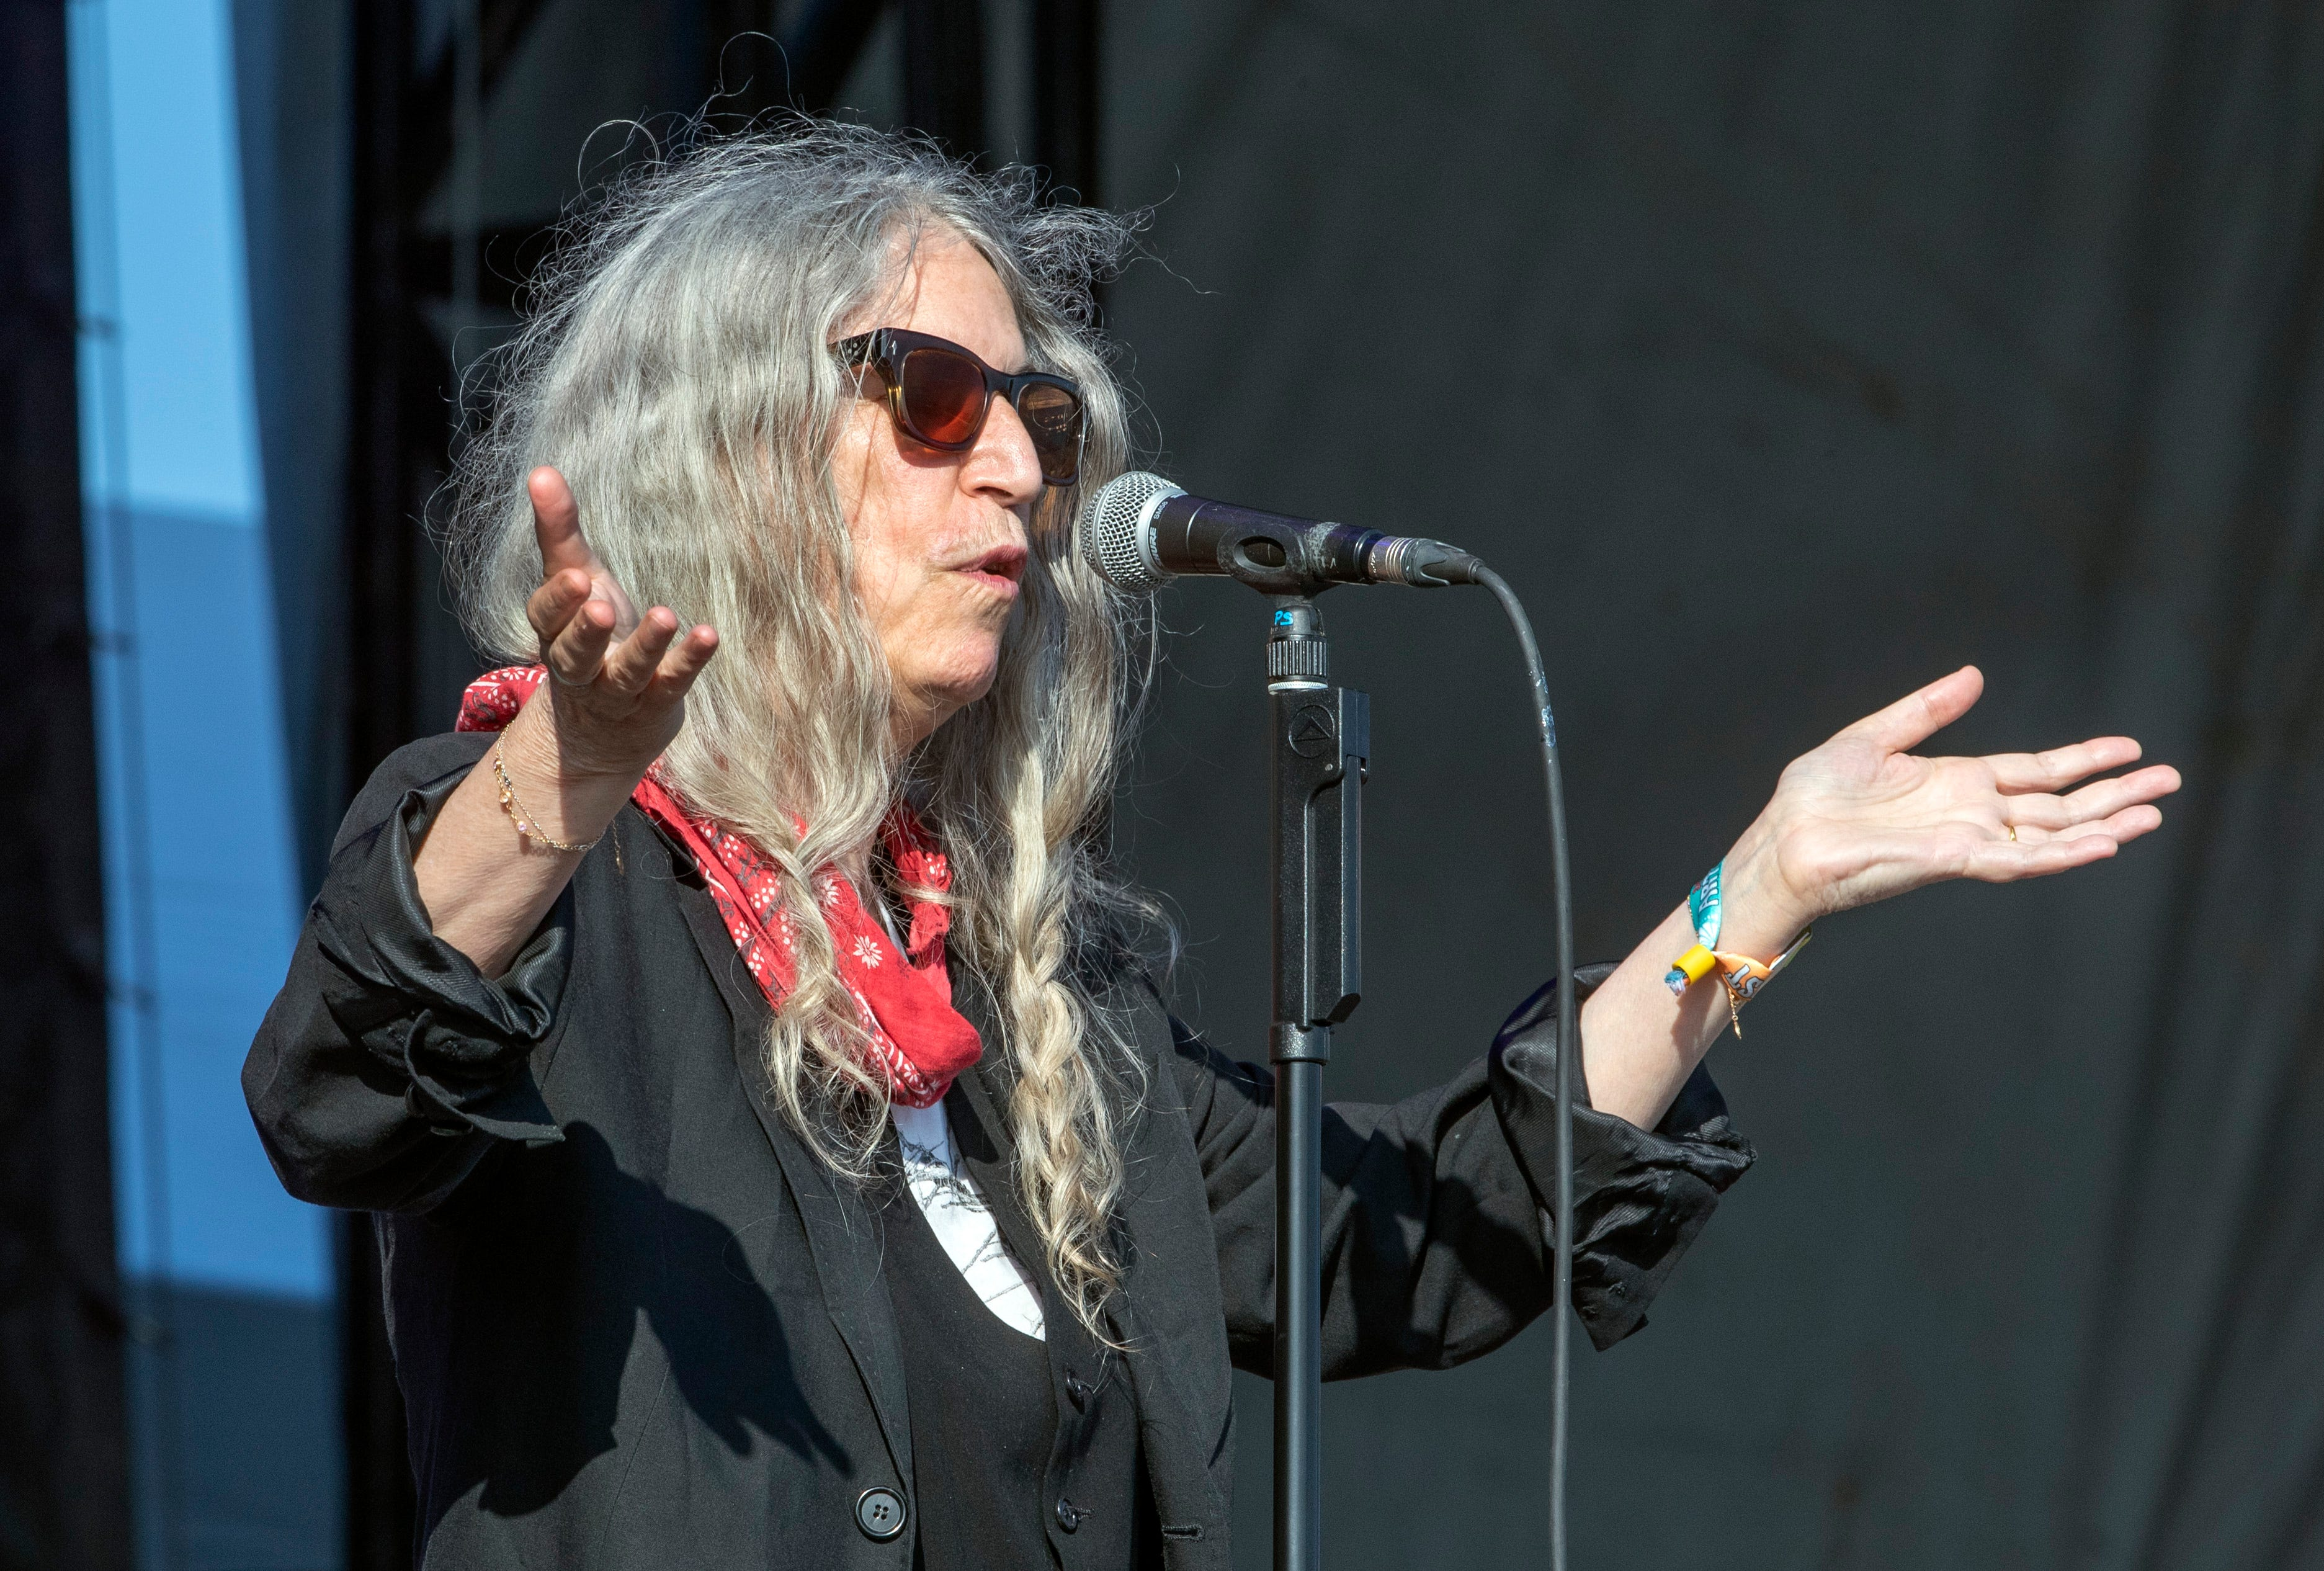 With mom on her mind, Patti Smith rocks Asbury Park beach at Sea Hear Now festival